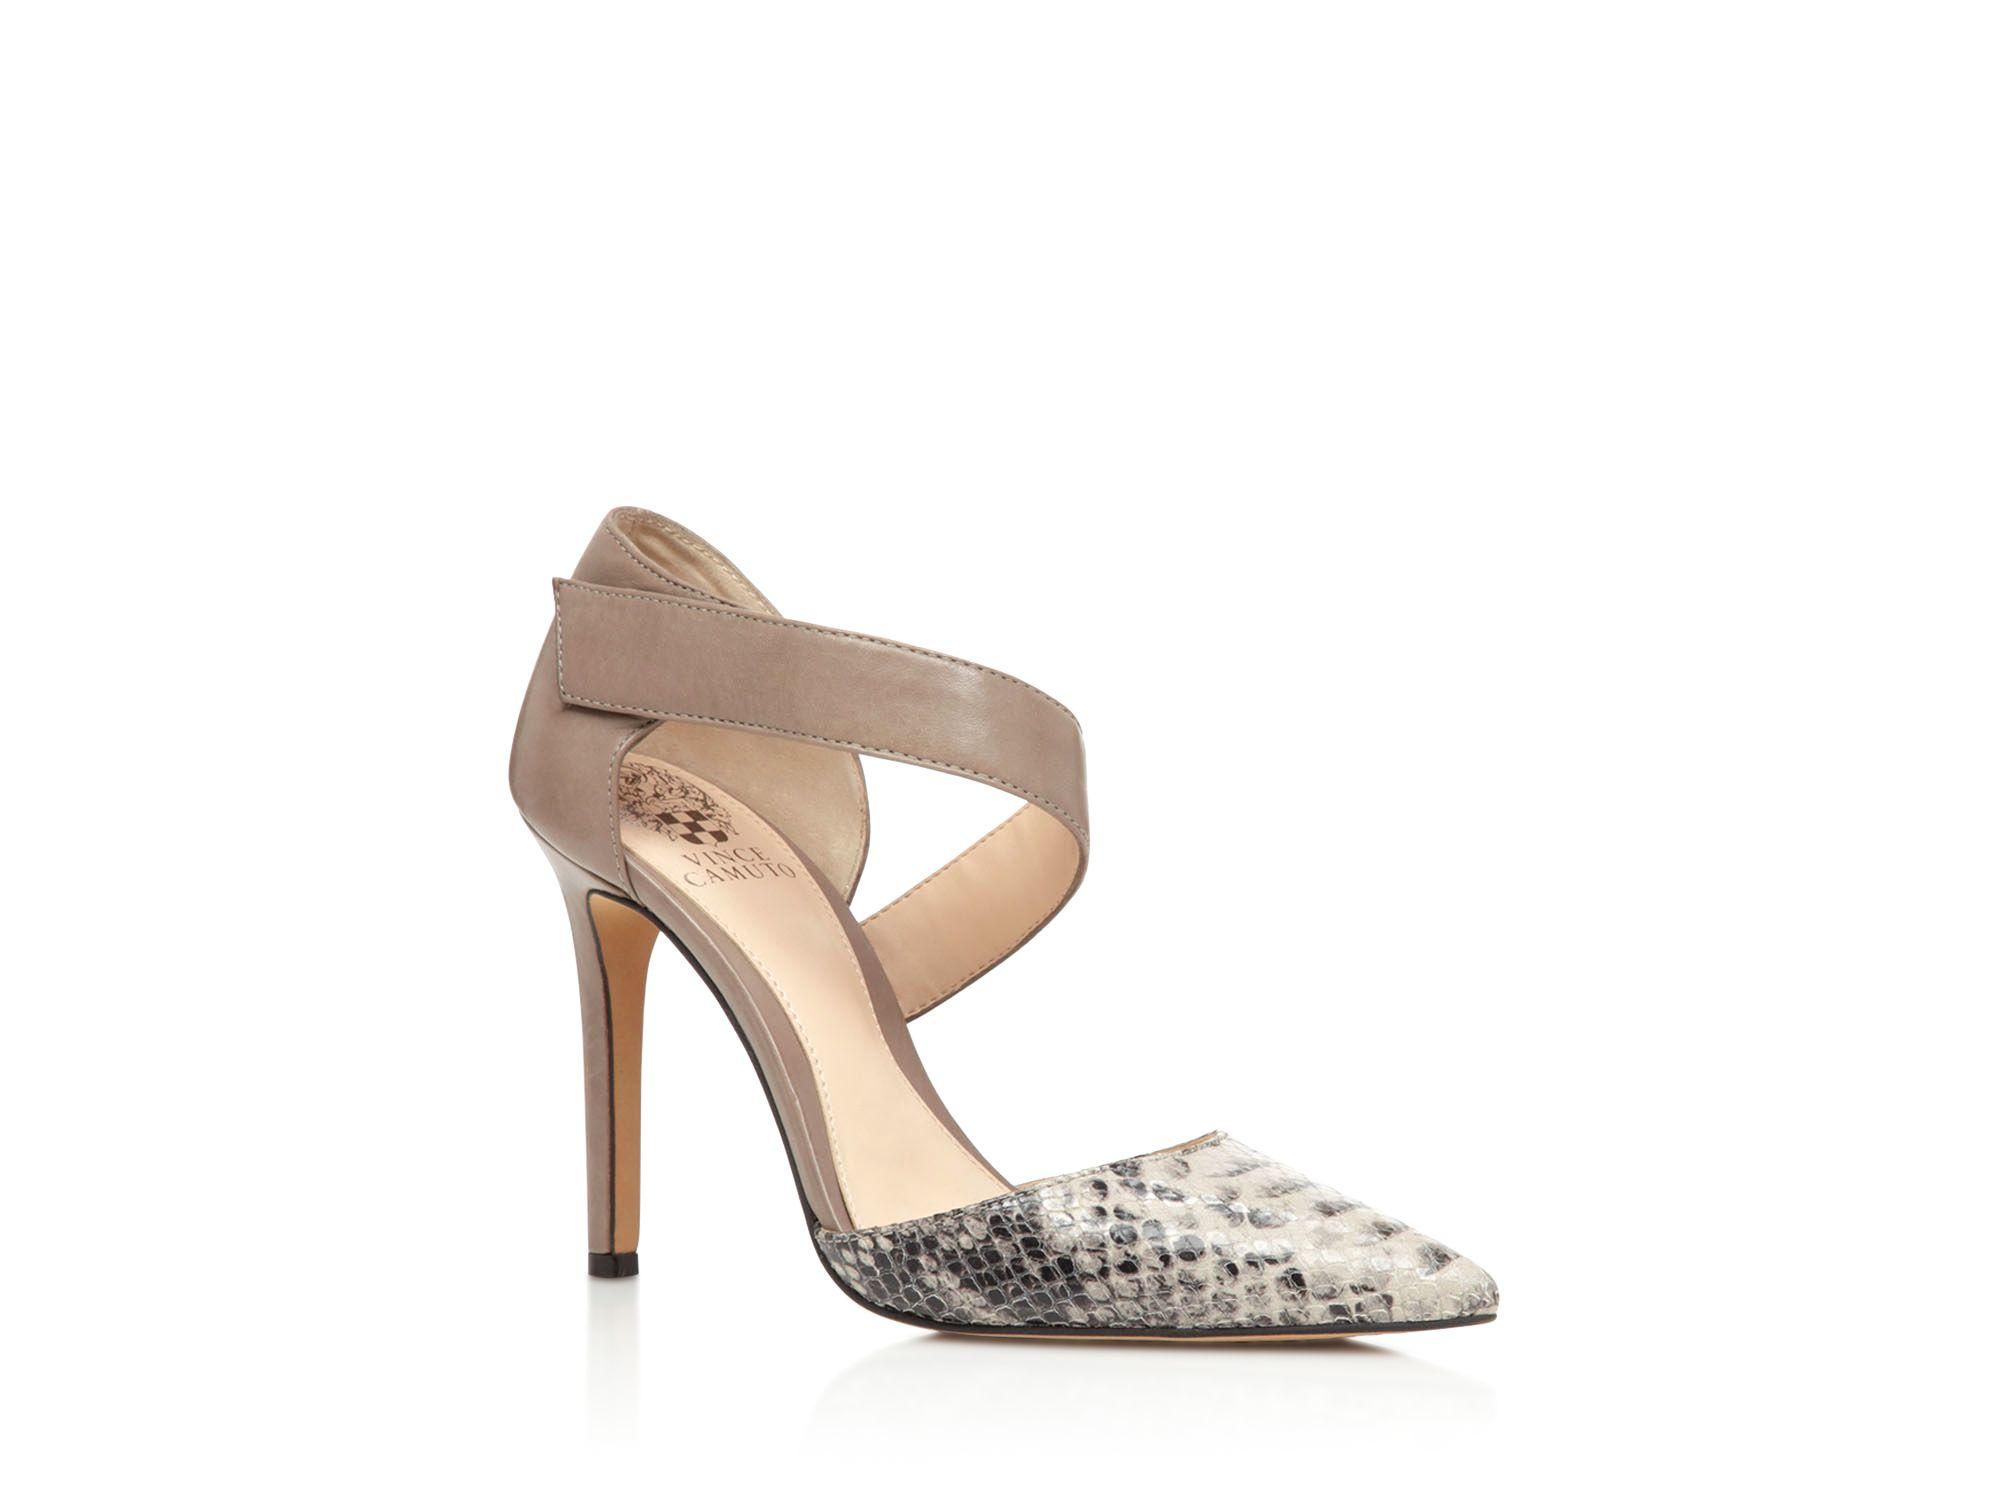 be8c4aeae35 Vince Camuto Gray Carlotte Asymmetrical Strap High Heel Pumps